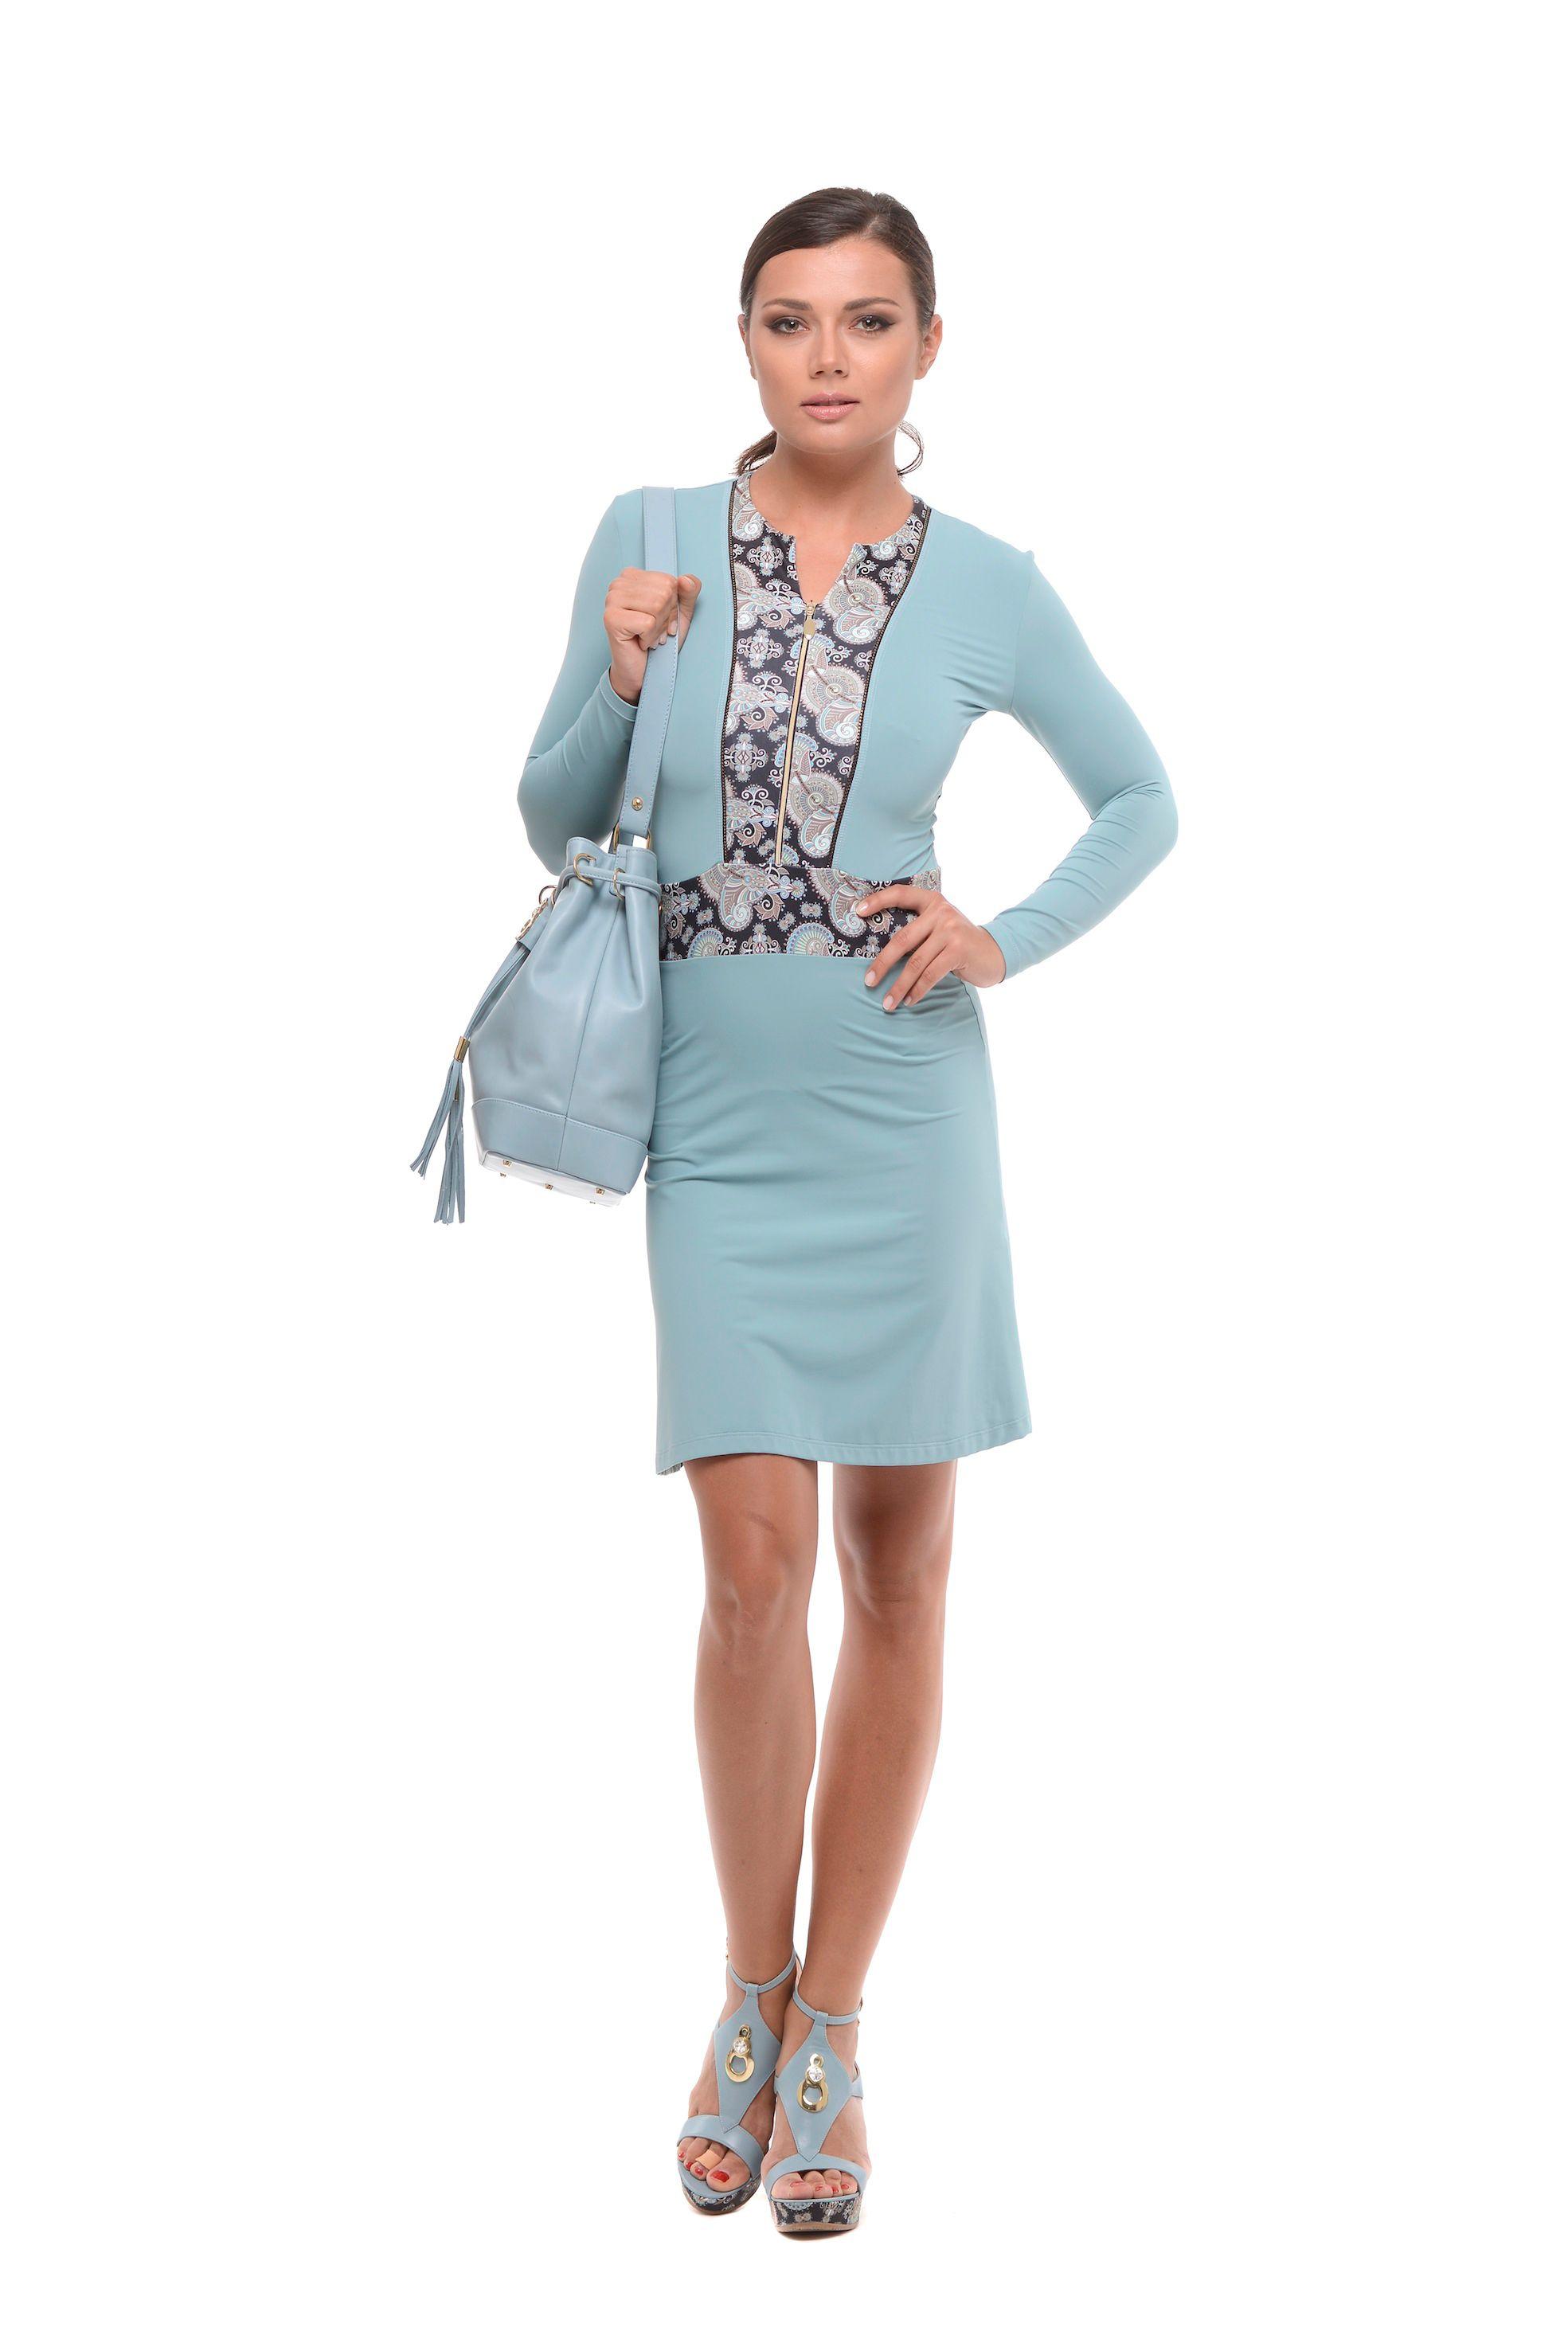 6c63cb0b7cee Krátke šaty na zips modré